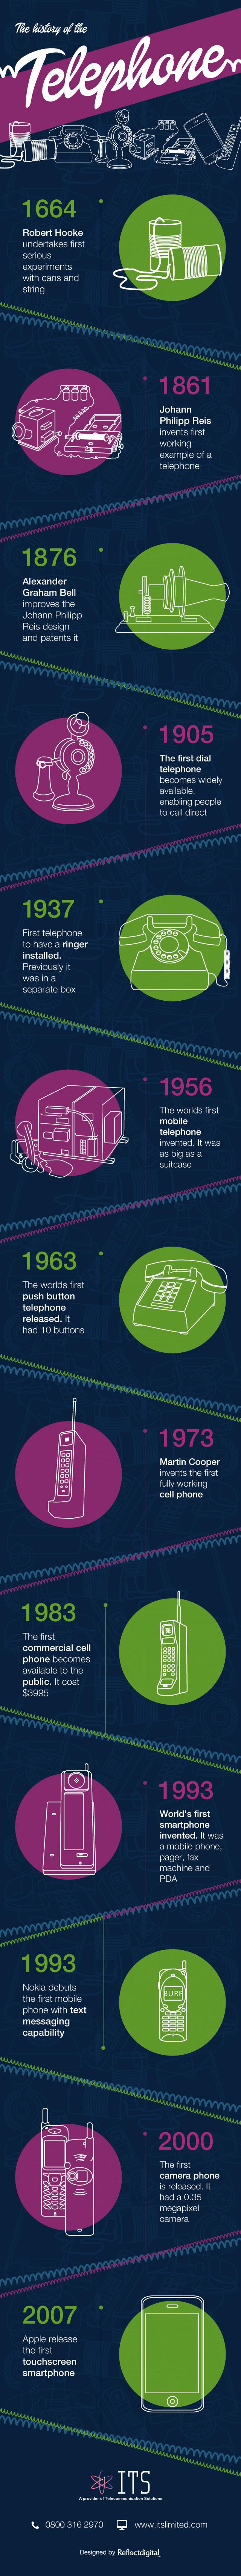 Genealogy of the smartphone